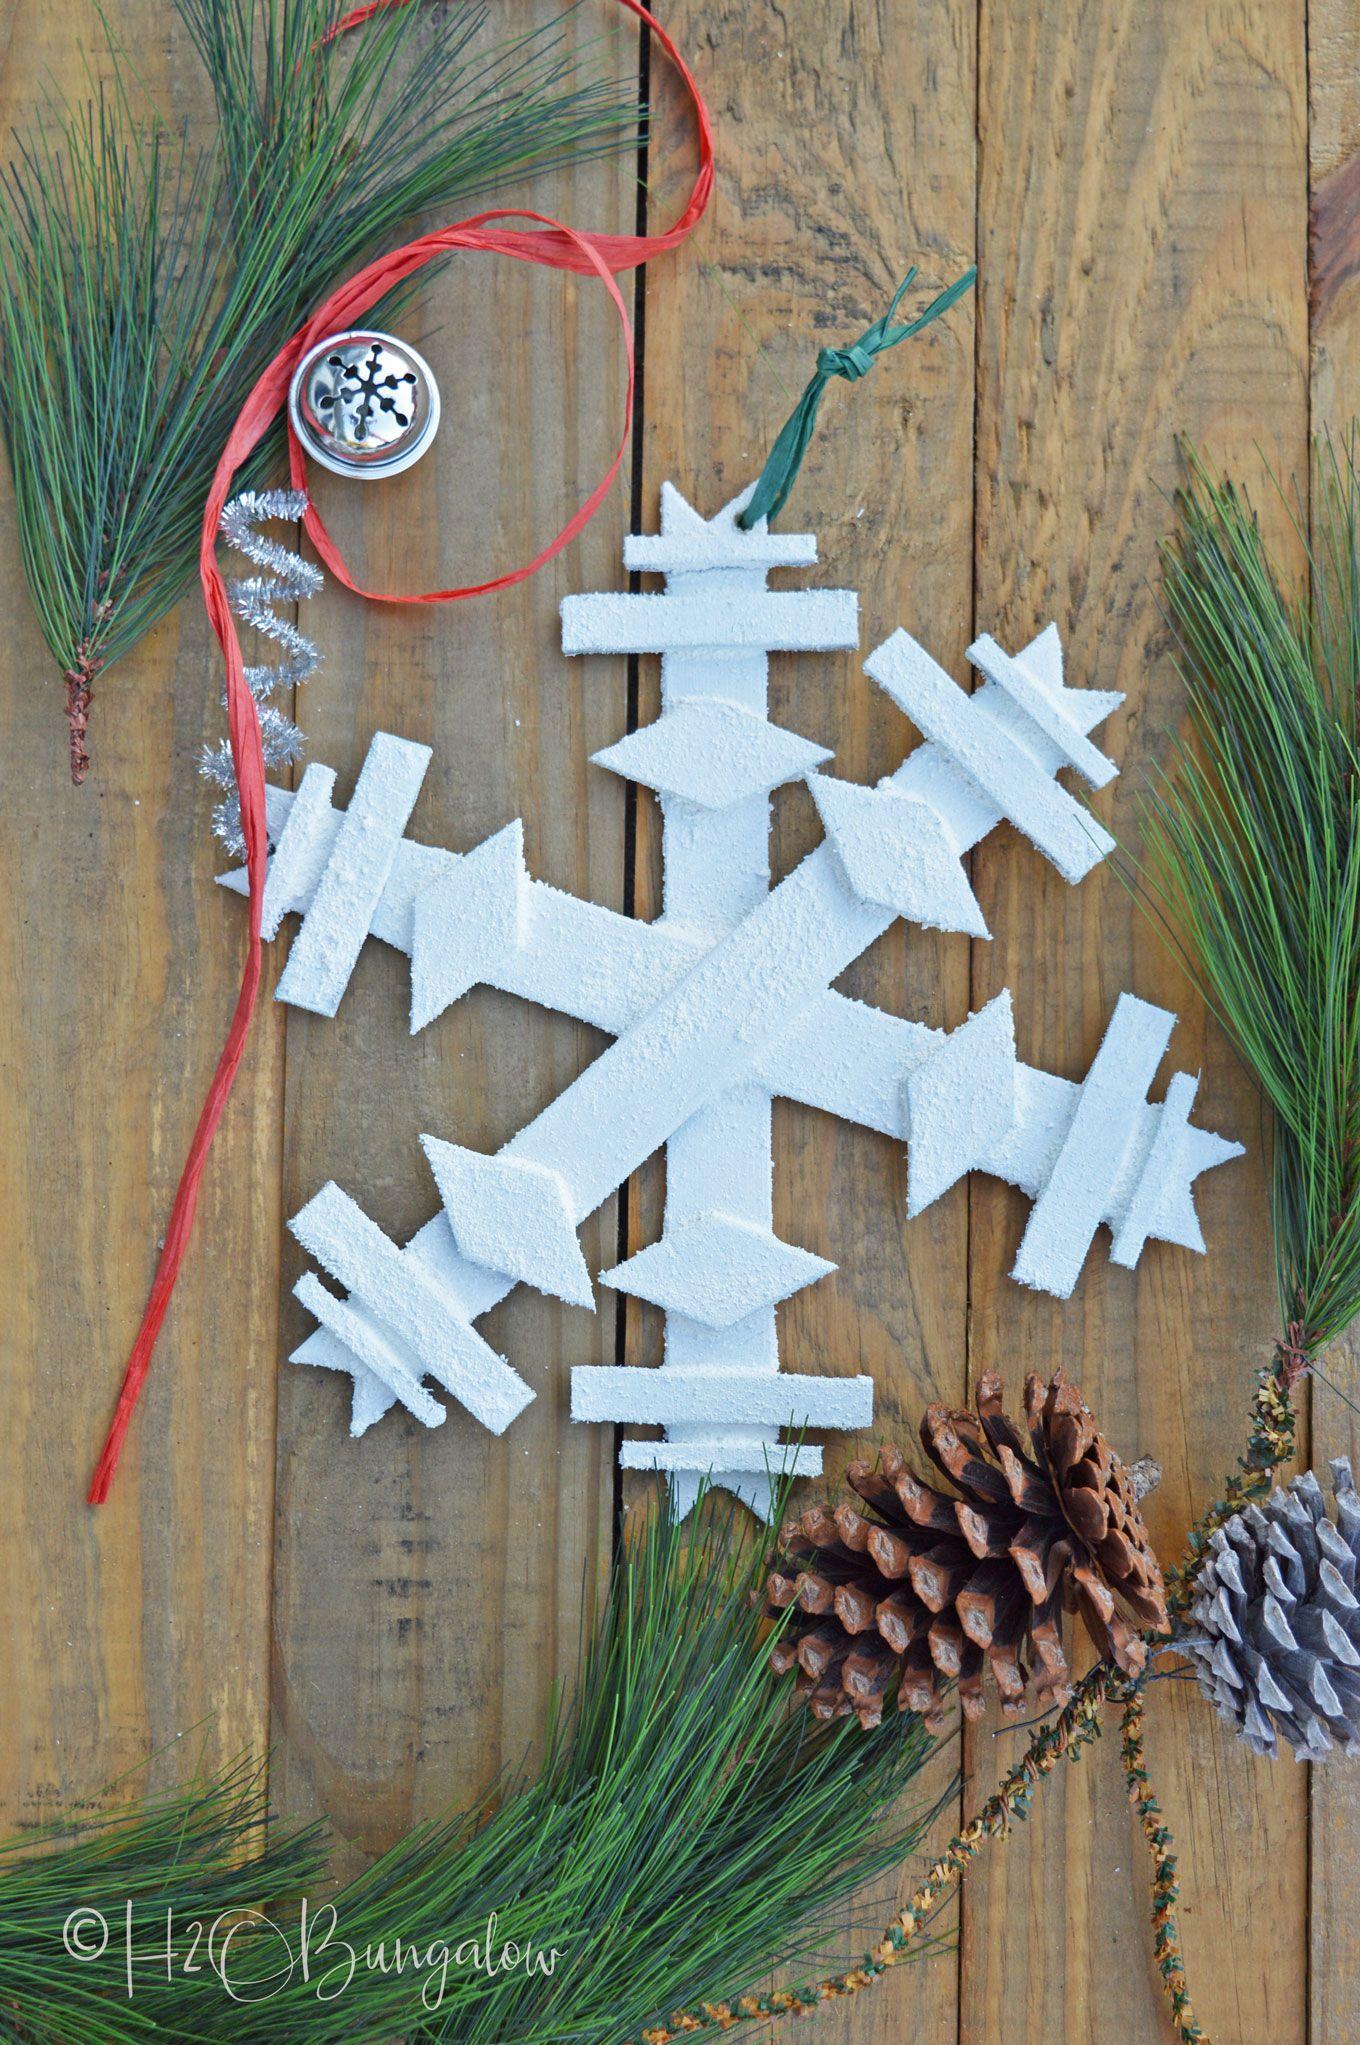 Diy Wooden Snowflake H2obungalow Wooden Snowflakes Wooden Diy Christmas Lanterns